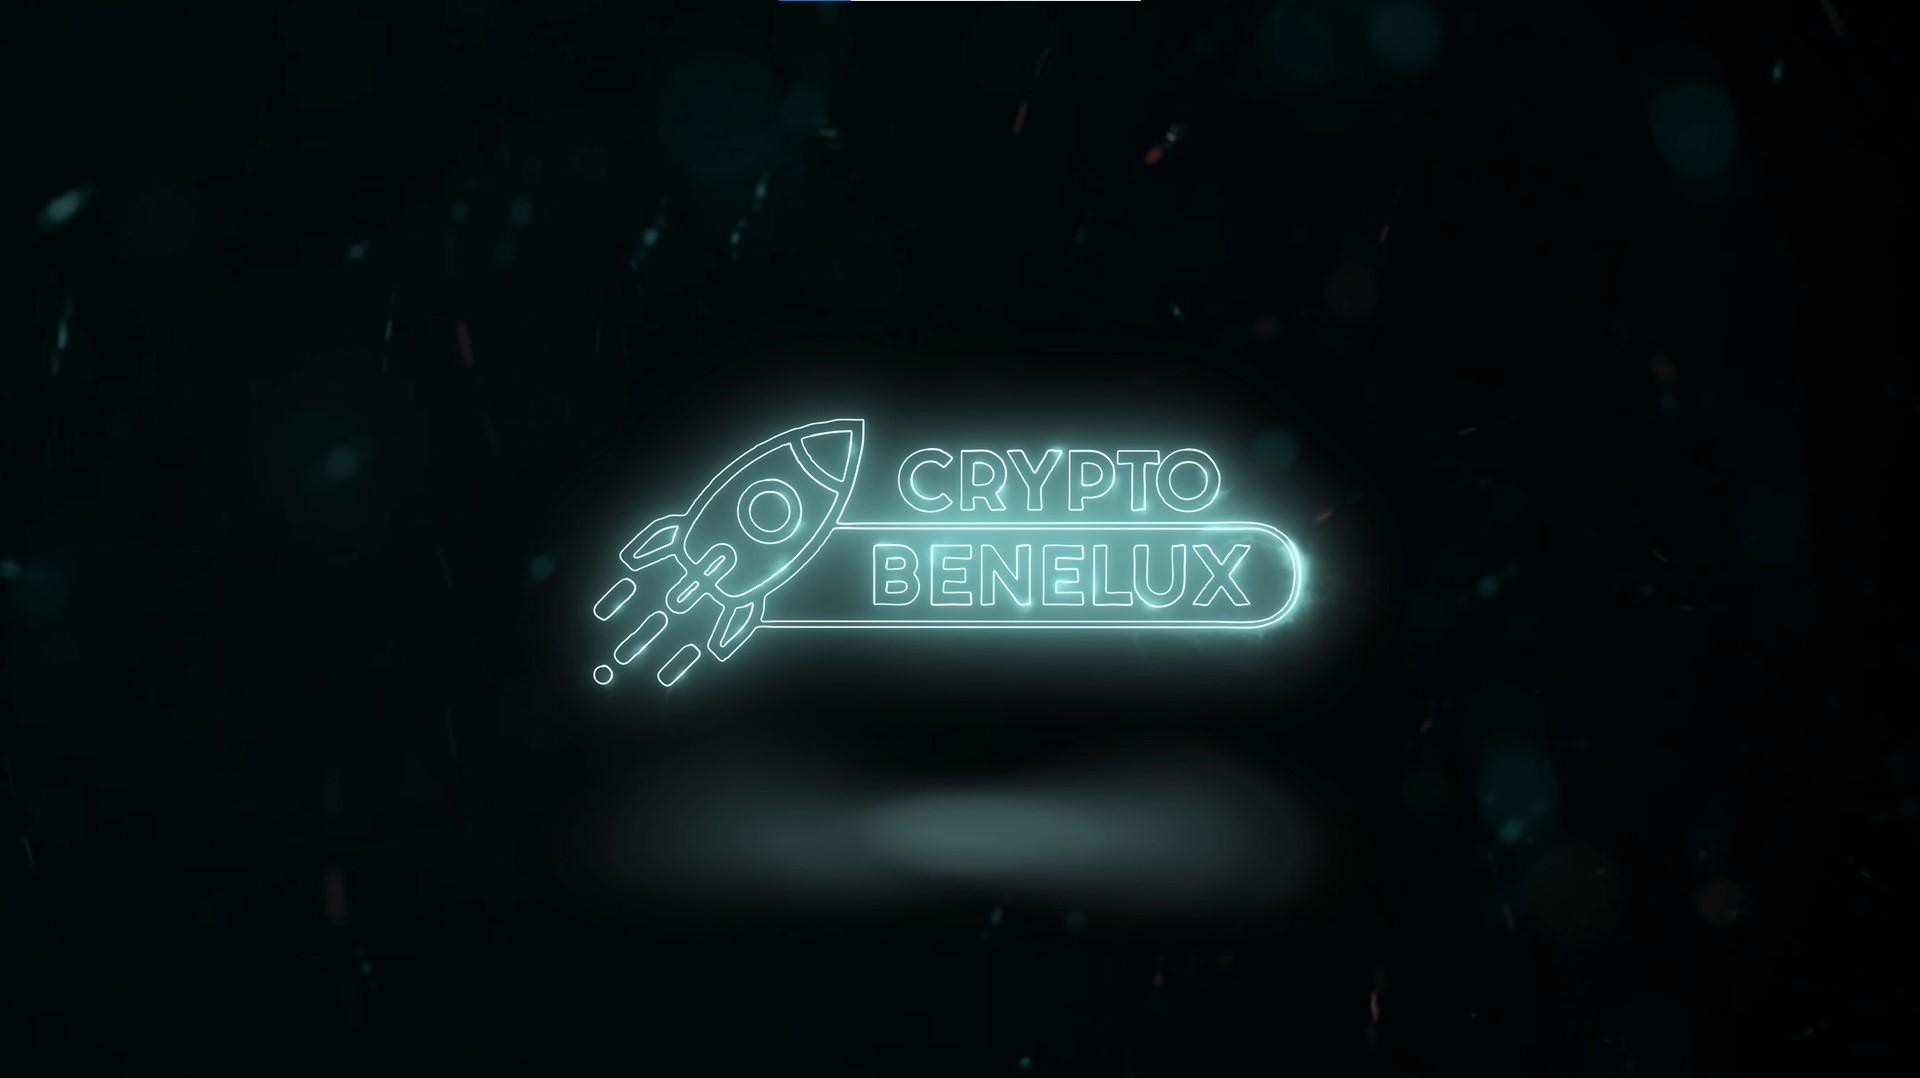 CryptoBenelux video: Shiba Inu (SHIB), is de hype over?